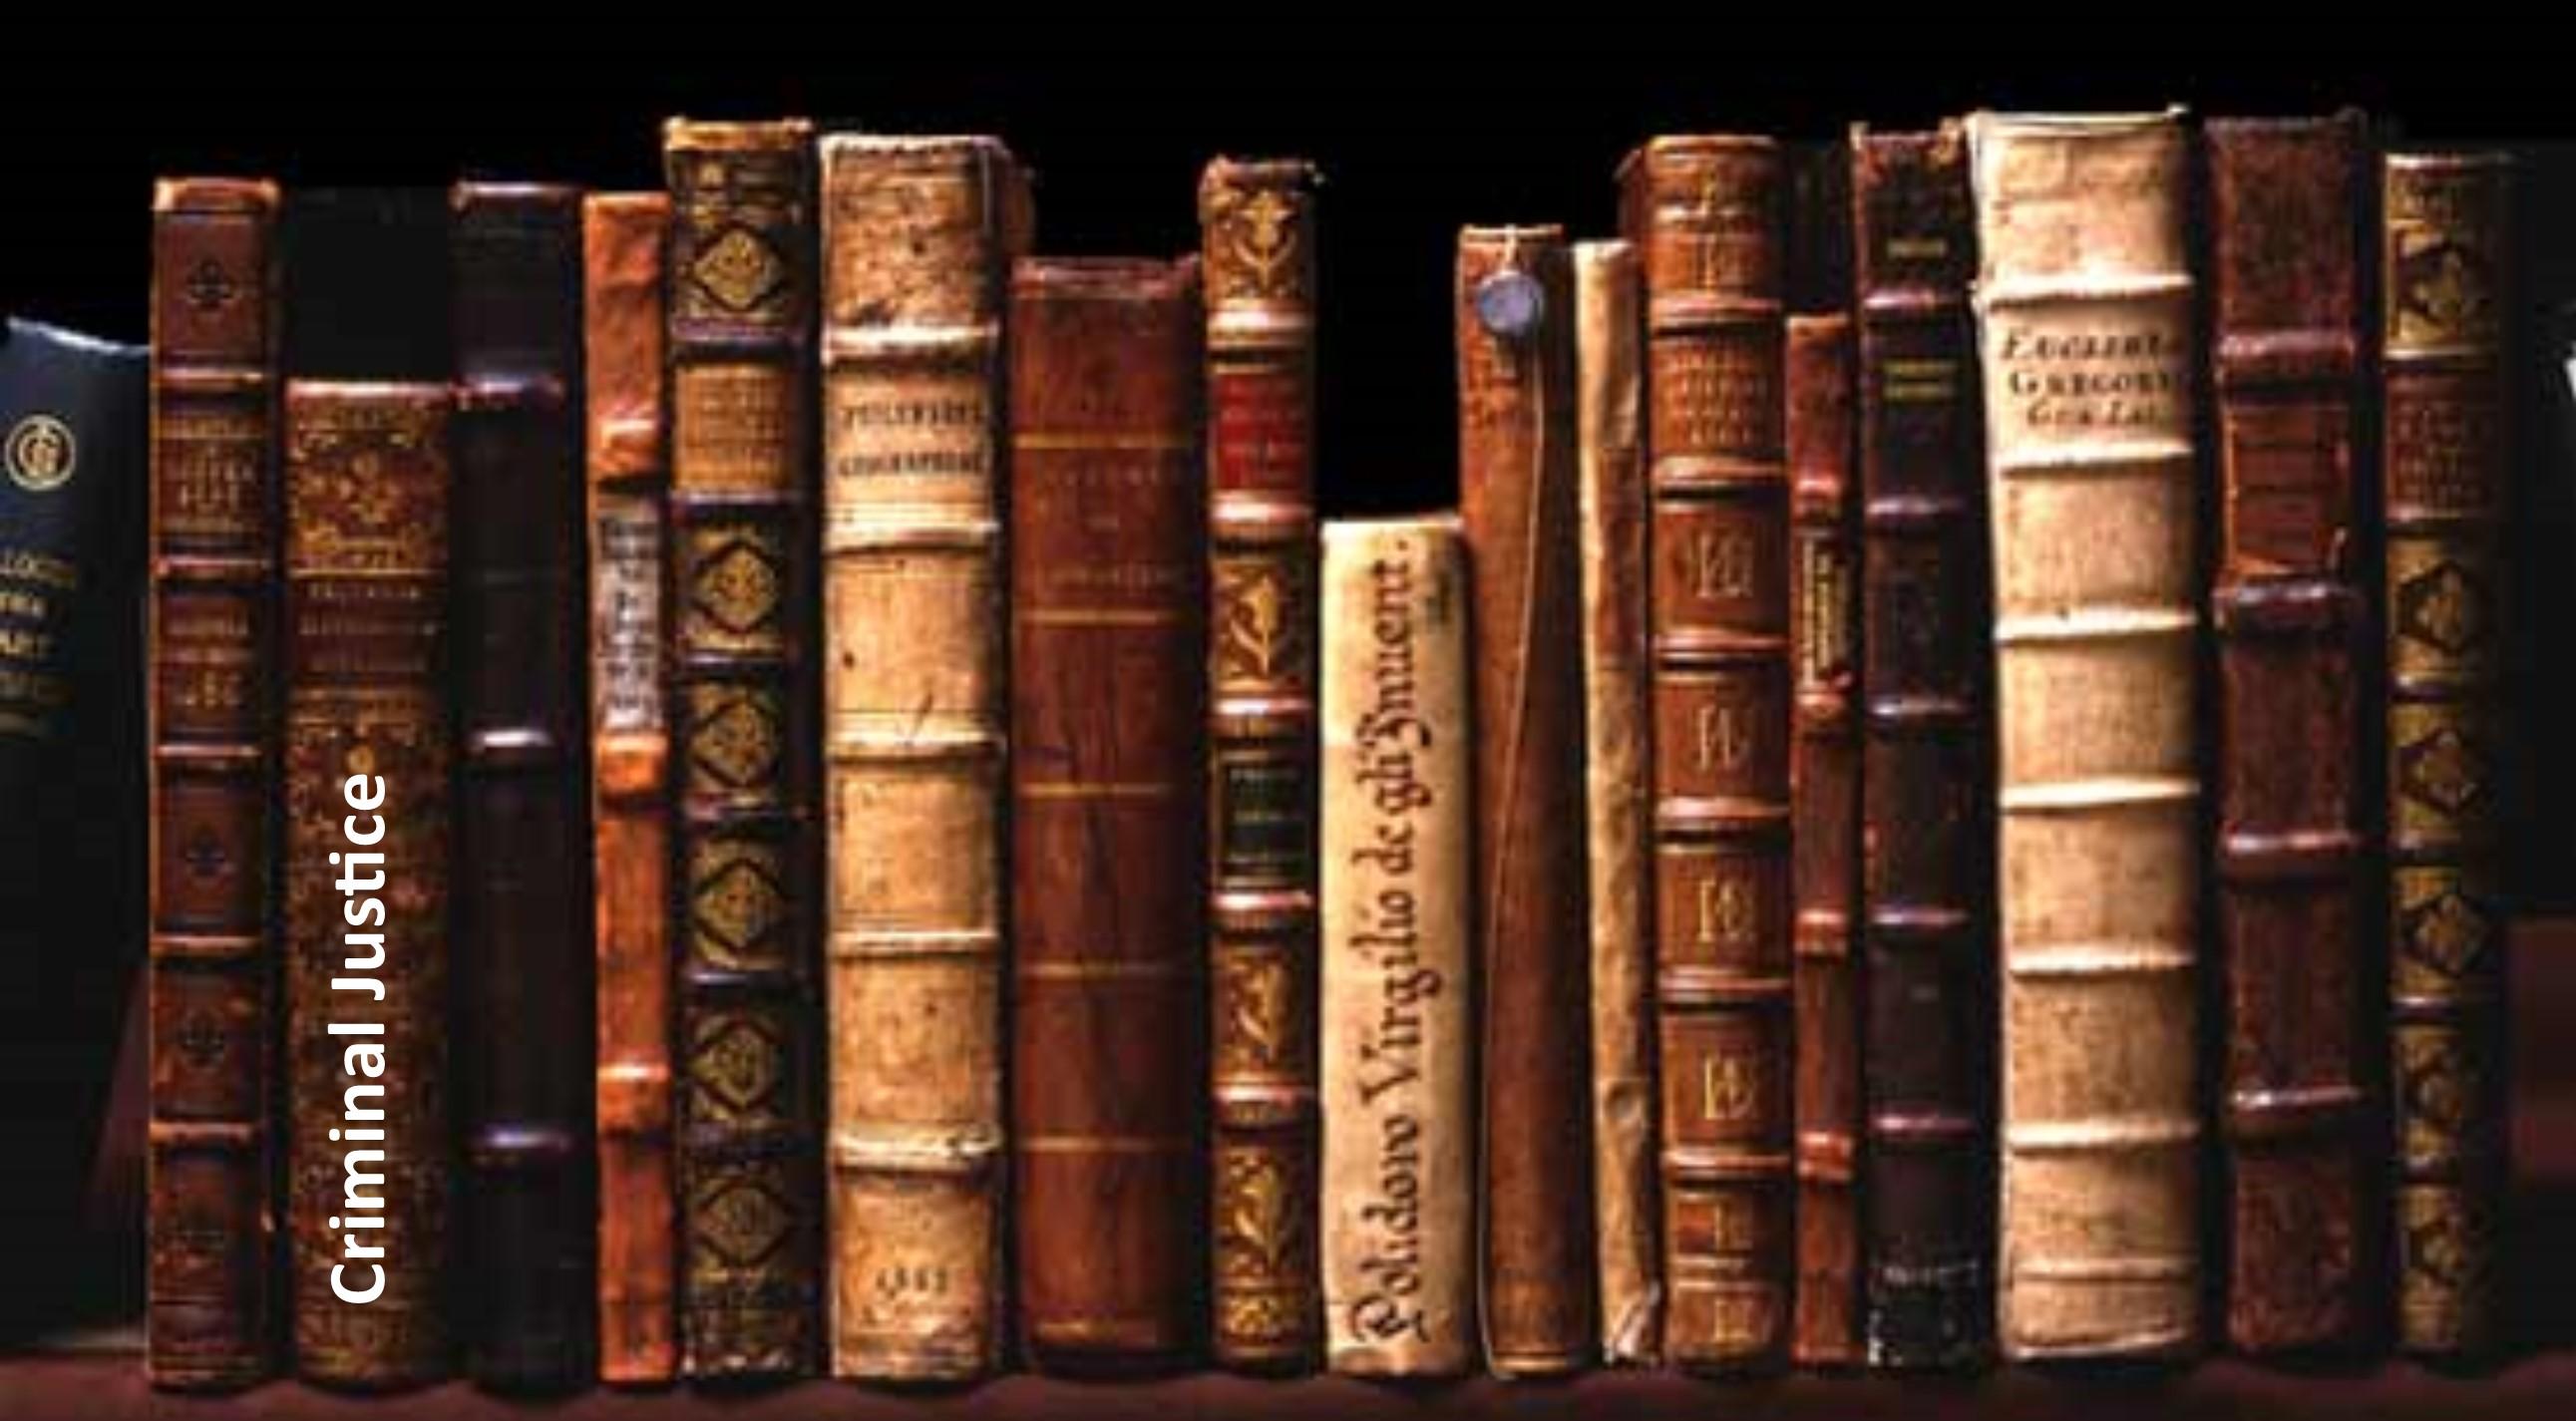 Library_Books_Criminal_Justice.jpg